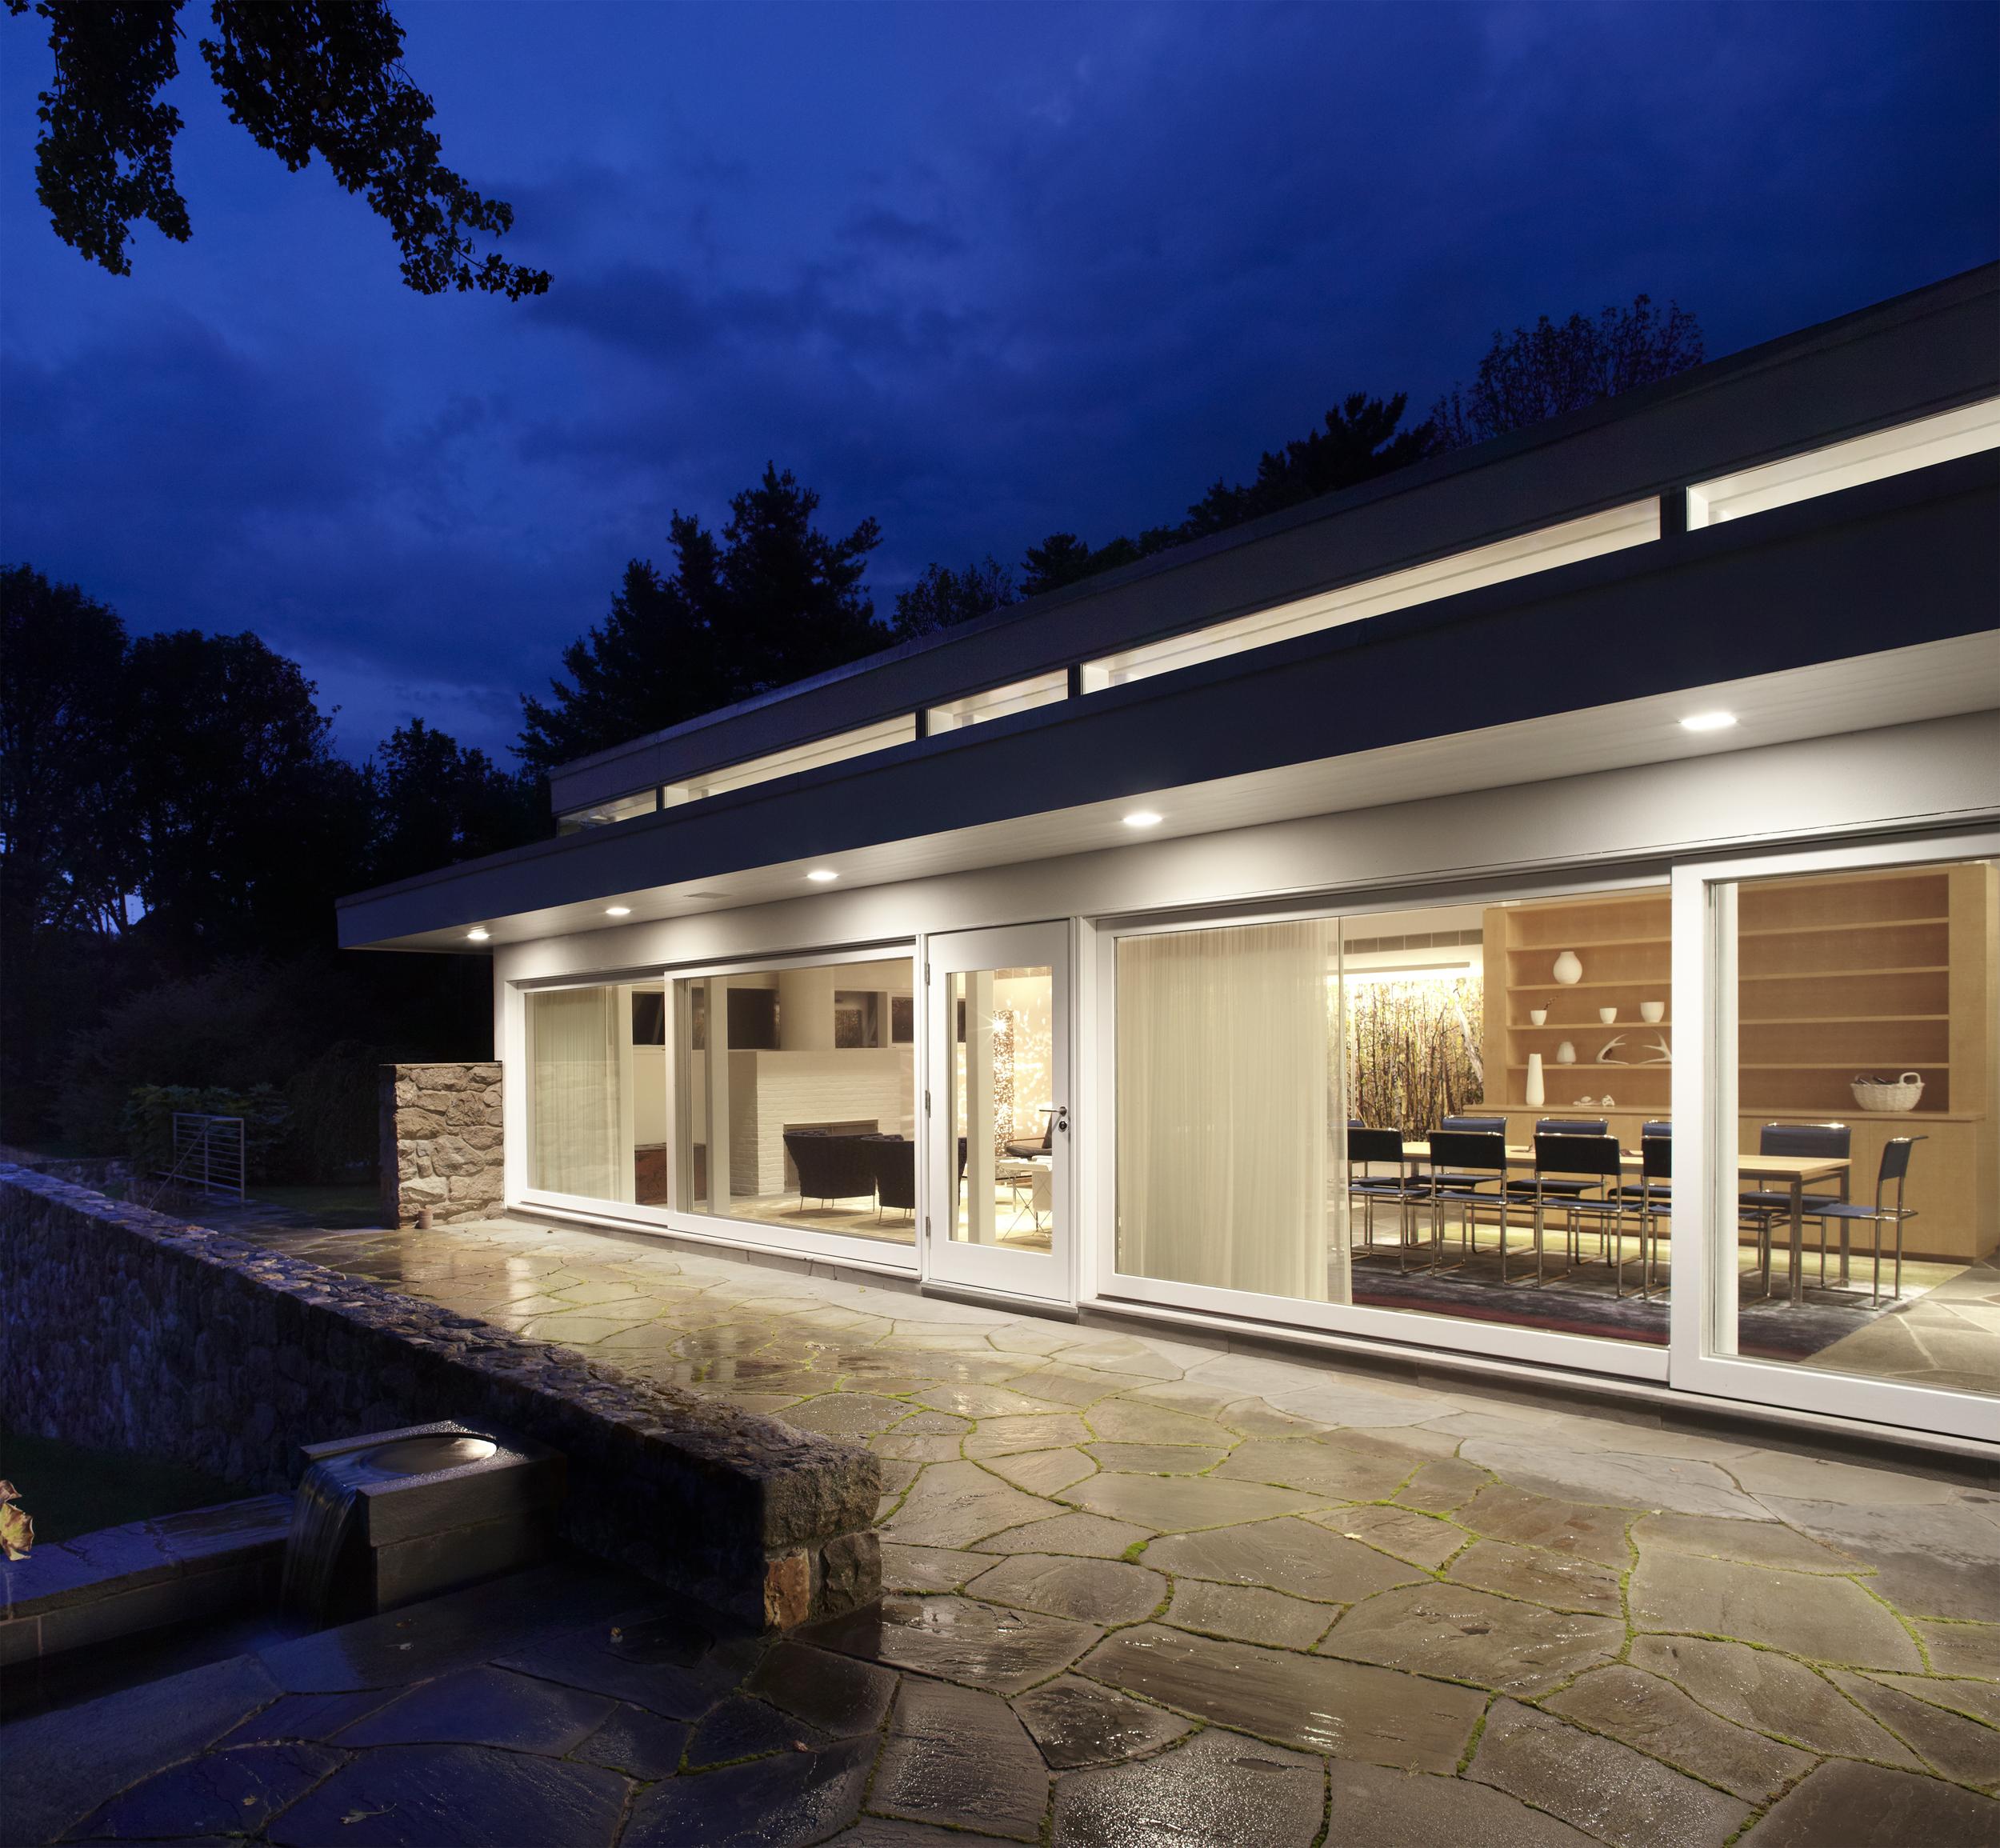 Marcel Breuer midcentury modern house in New Canaan